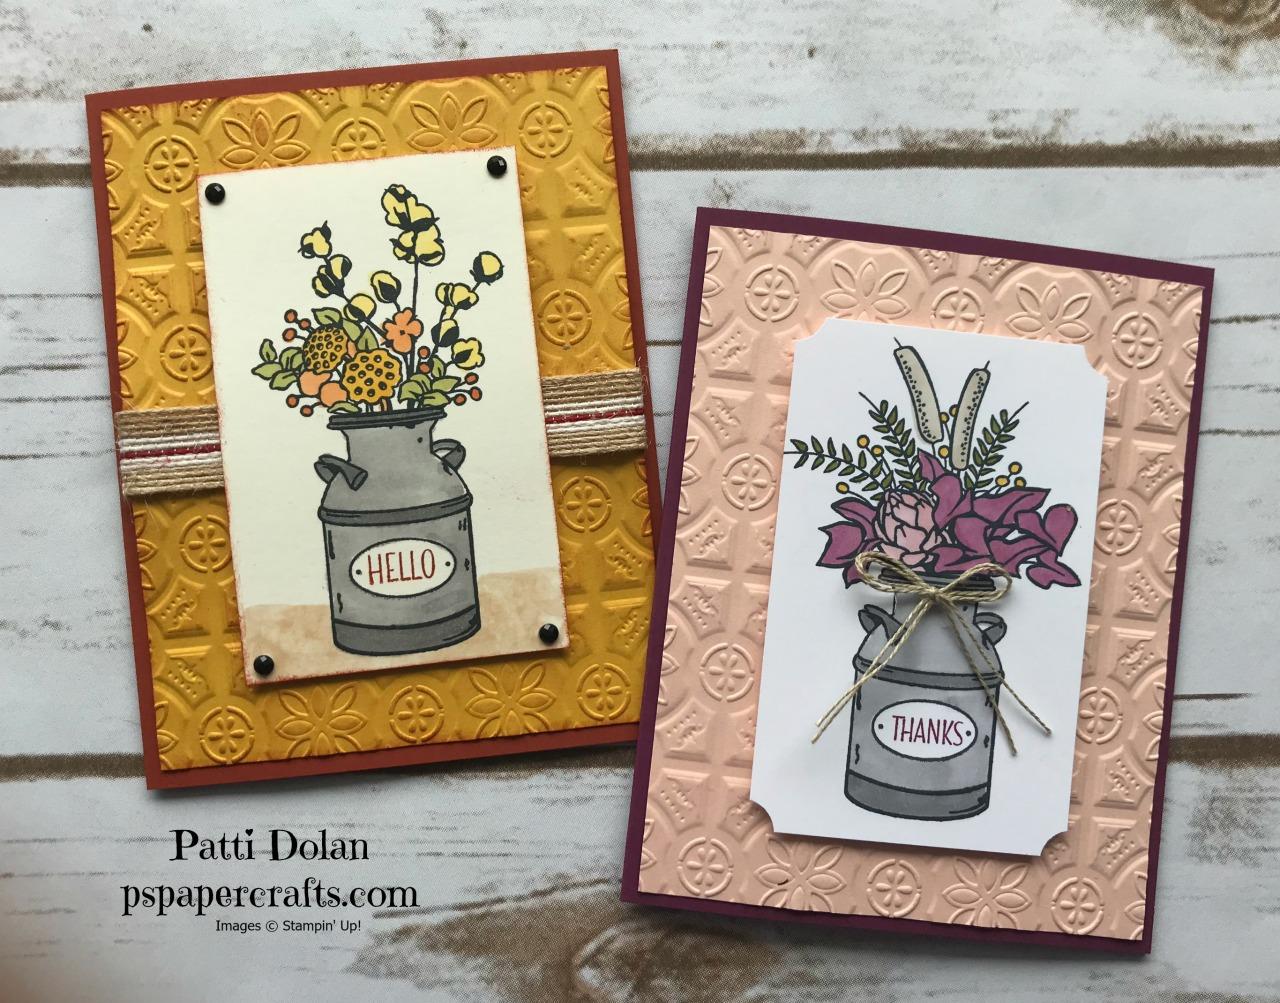 Country Home Tin Tile Both Small.jpg